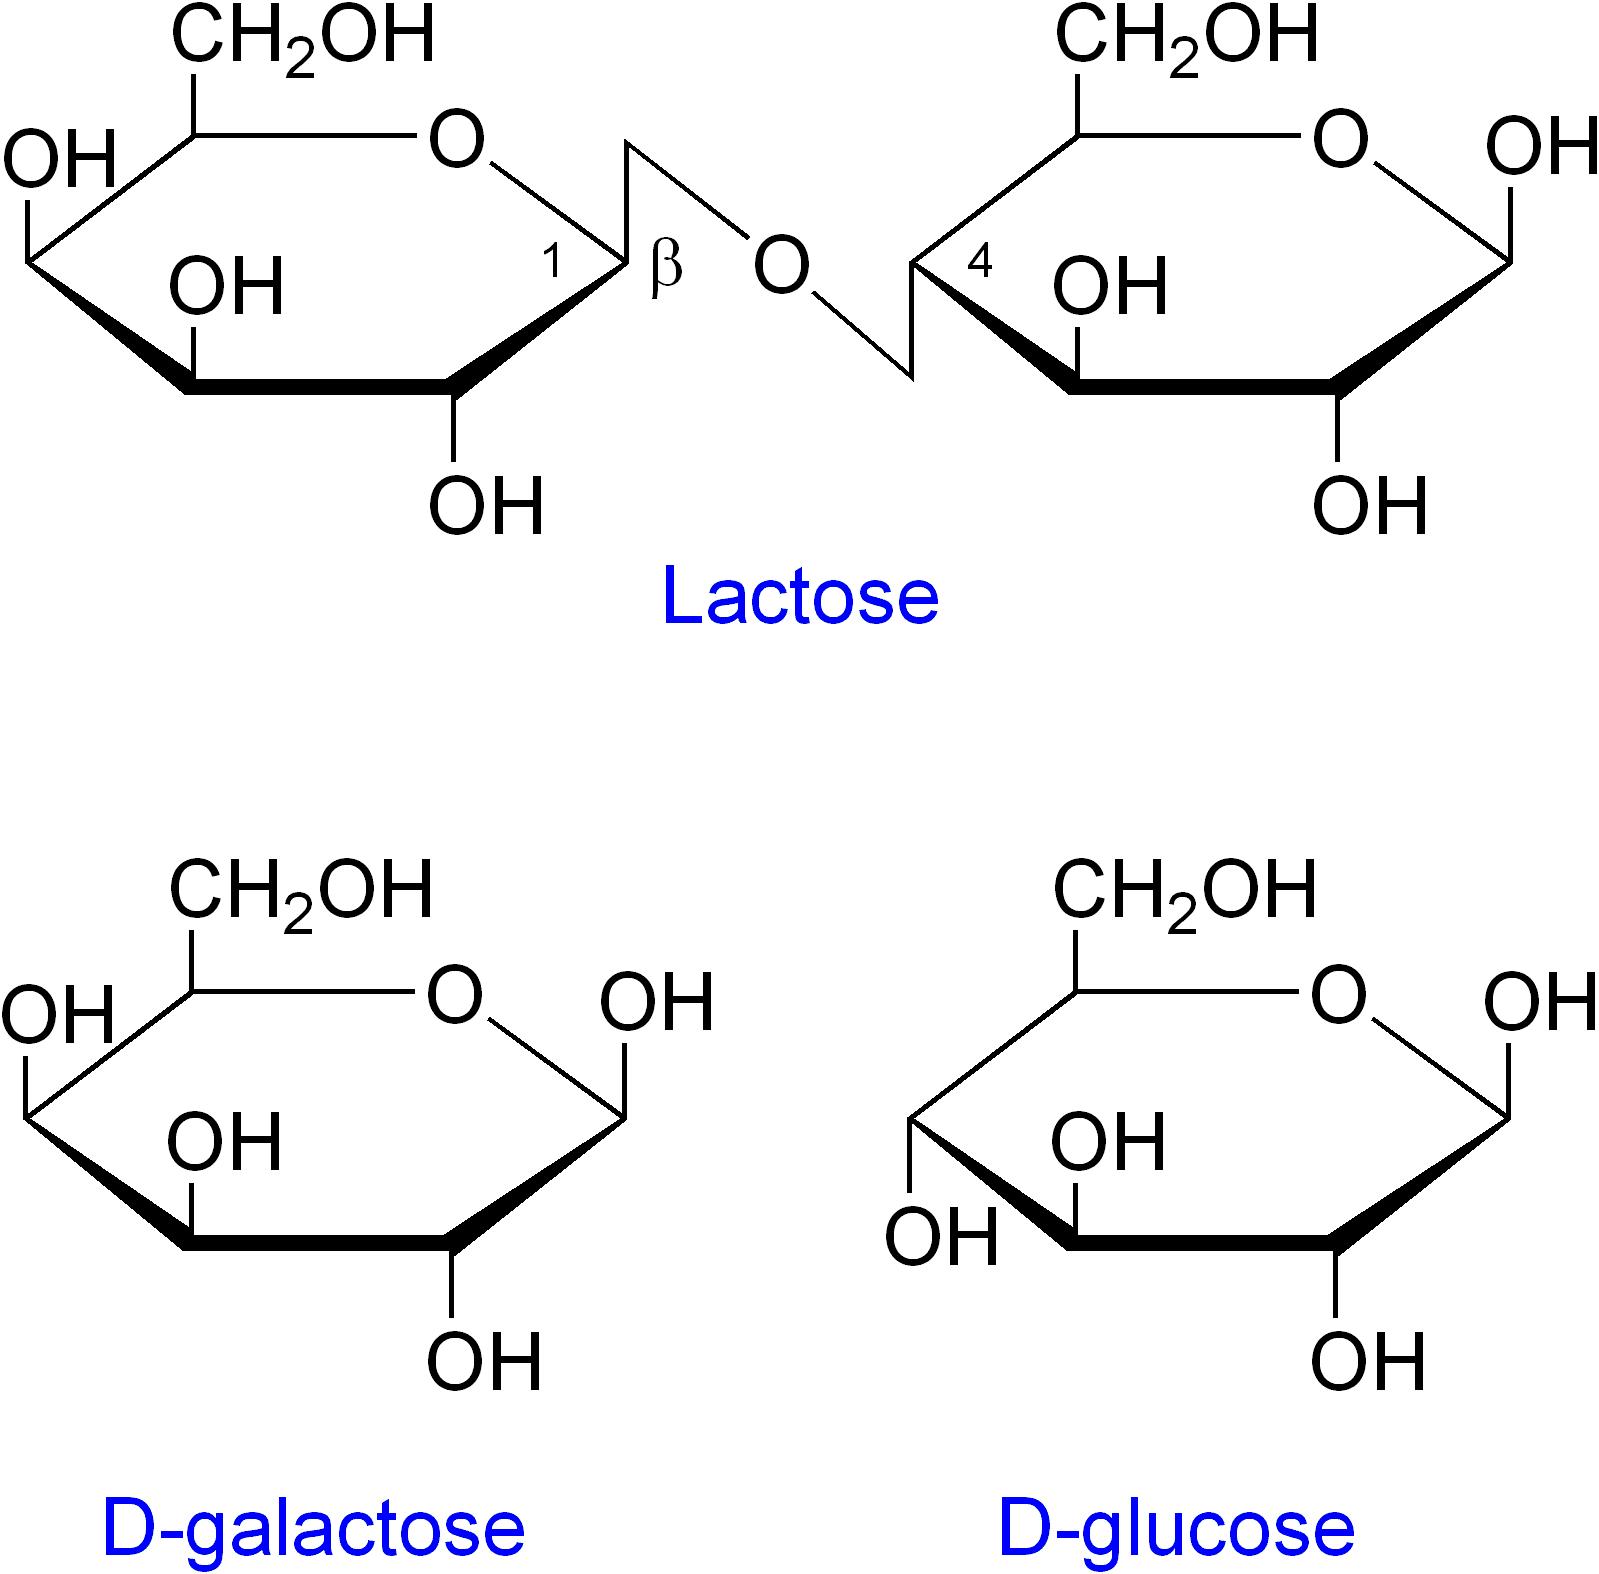 lactose structure - photo #2